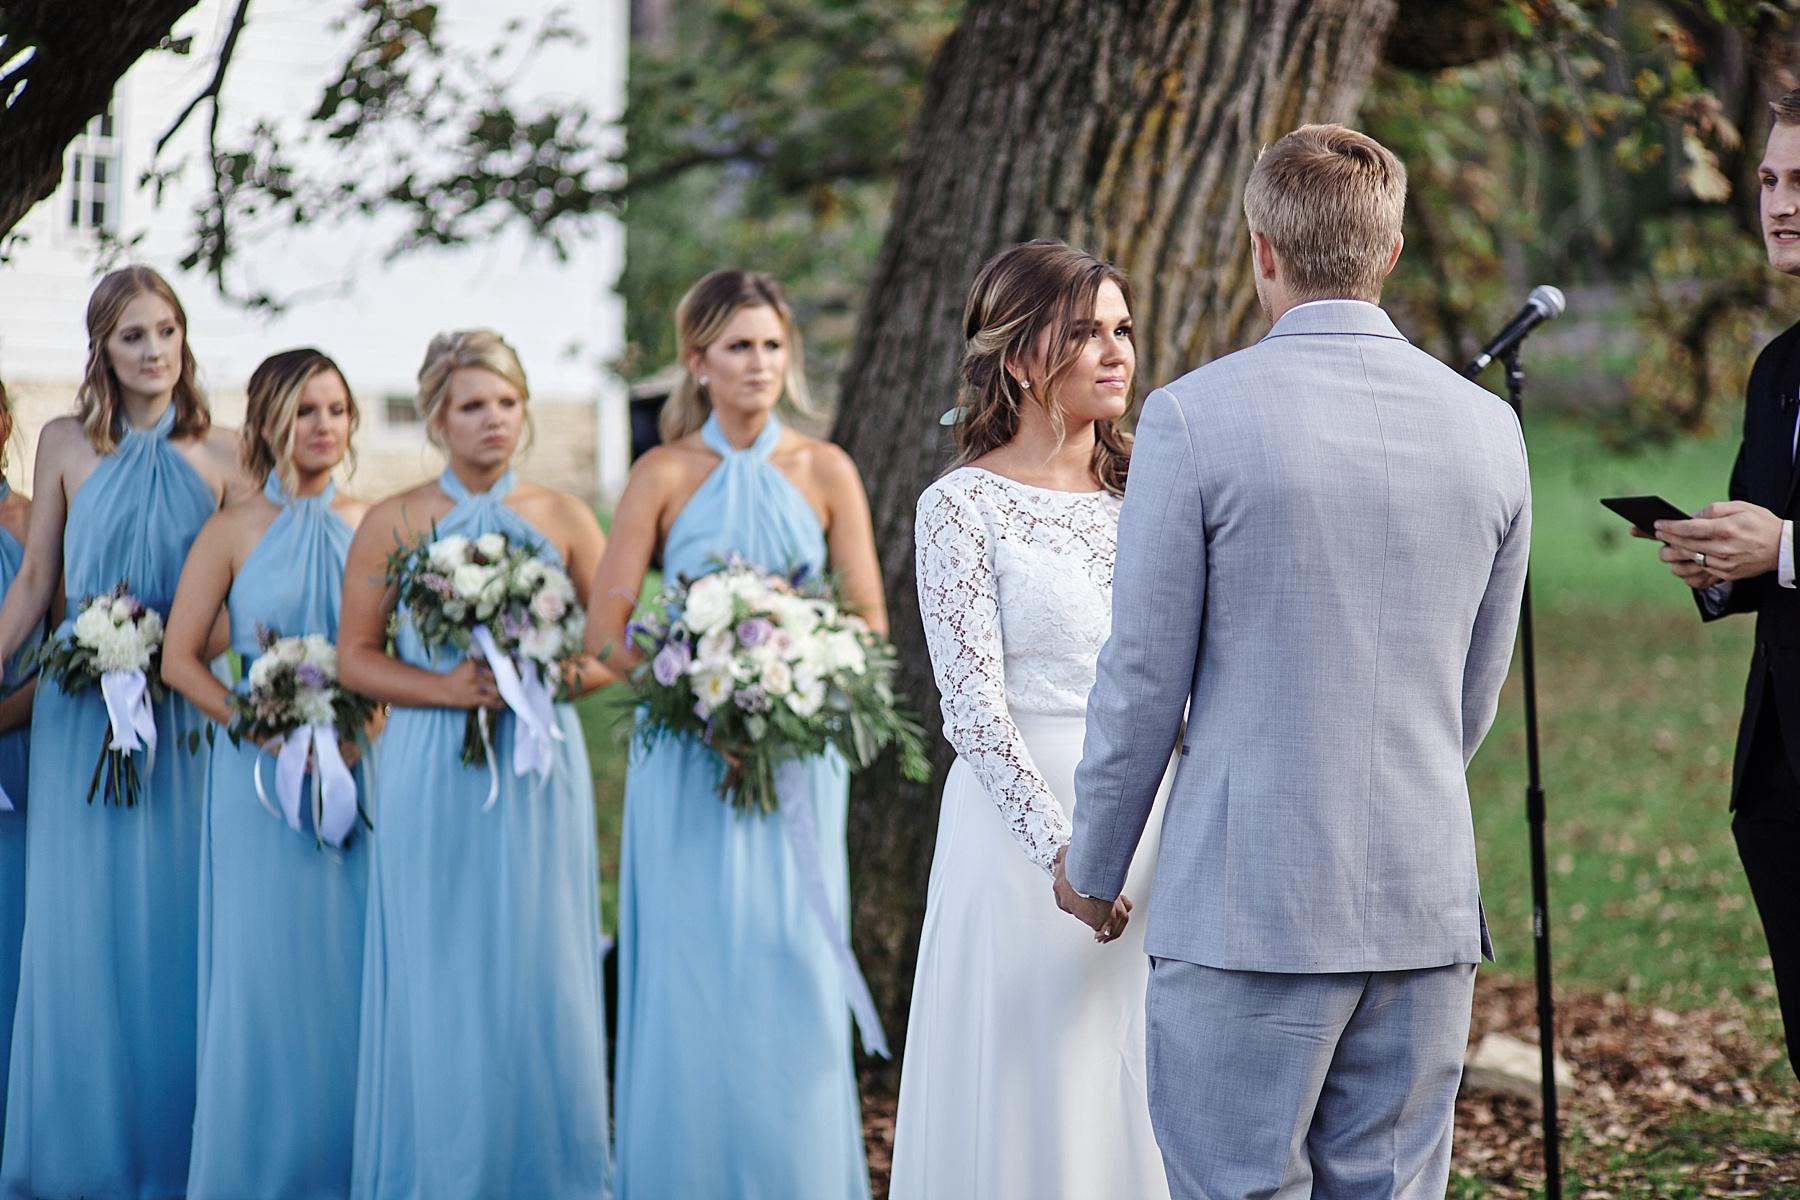 Maywood-Stone-Barn-Wedding-Rochester-Minnesota-Perry-James-Photo_0640.jpg